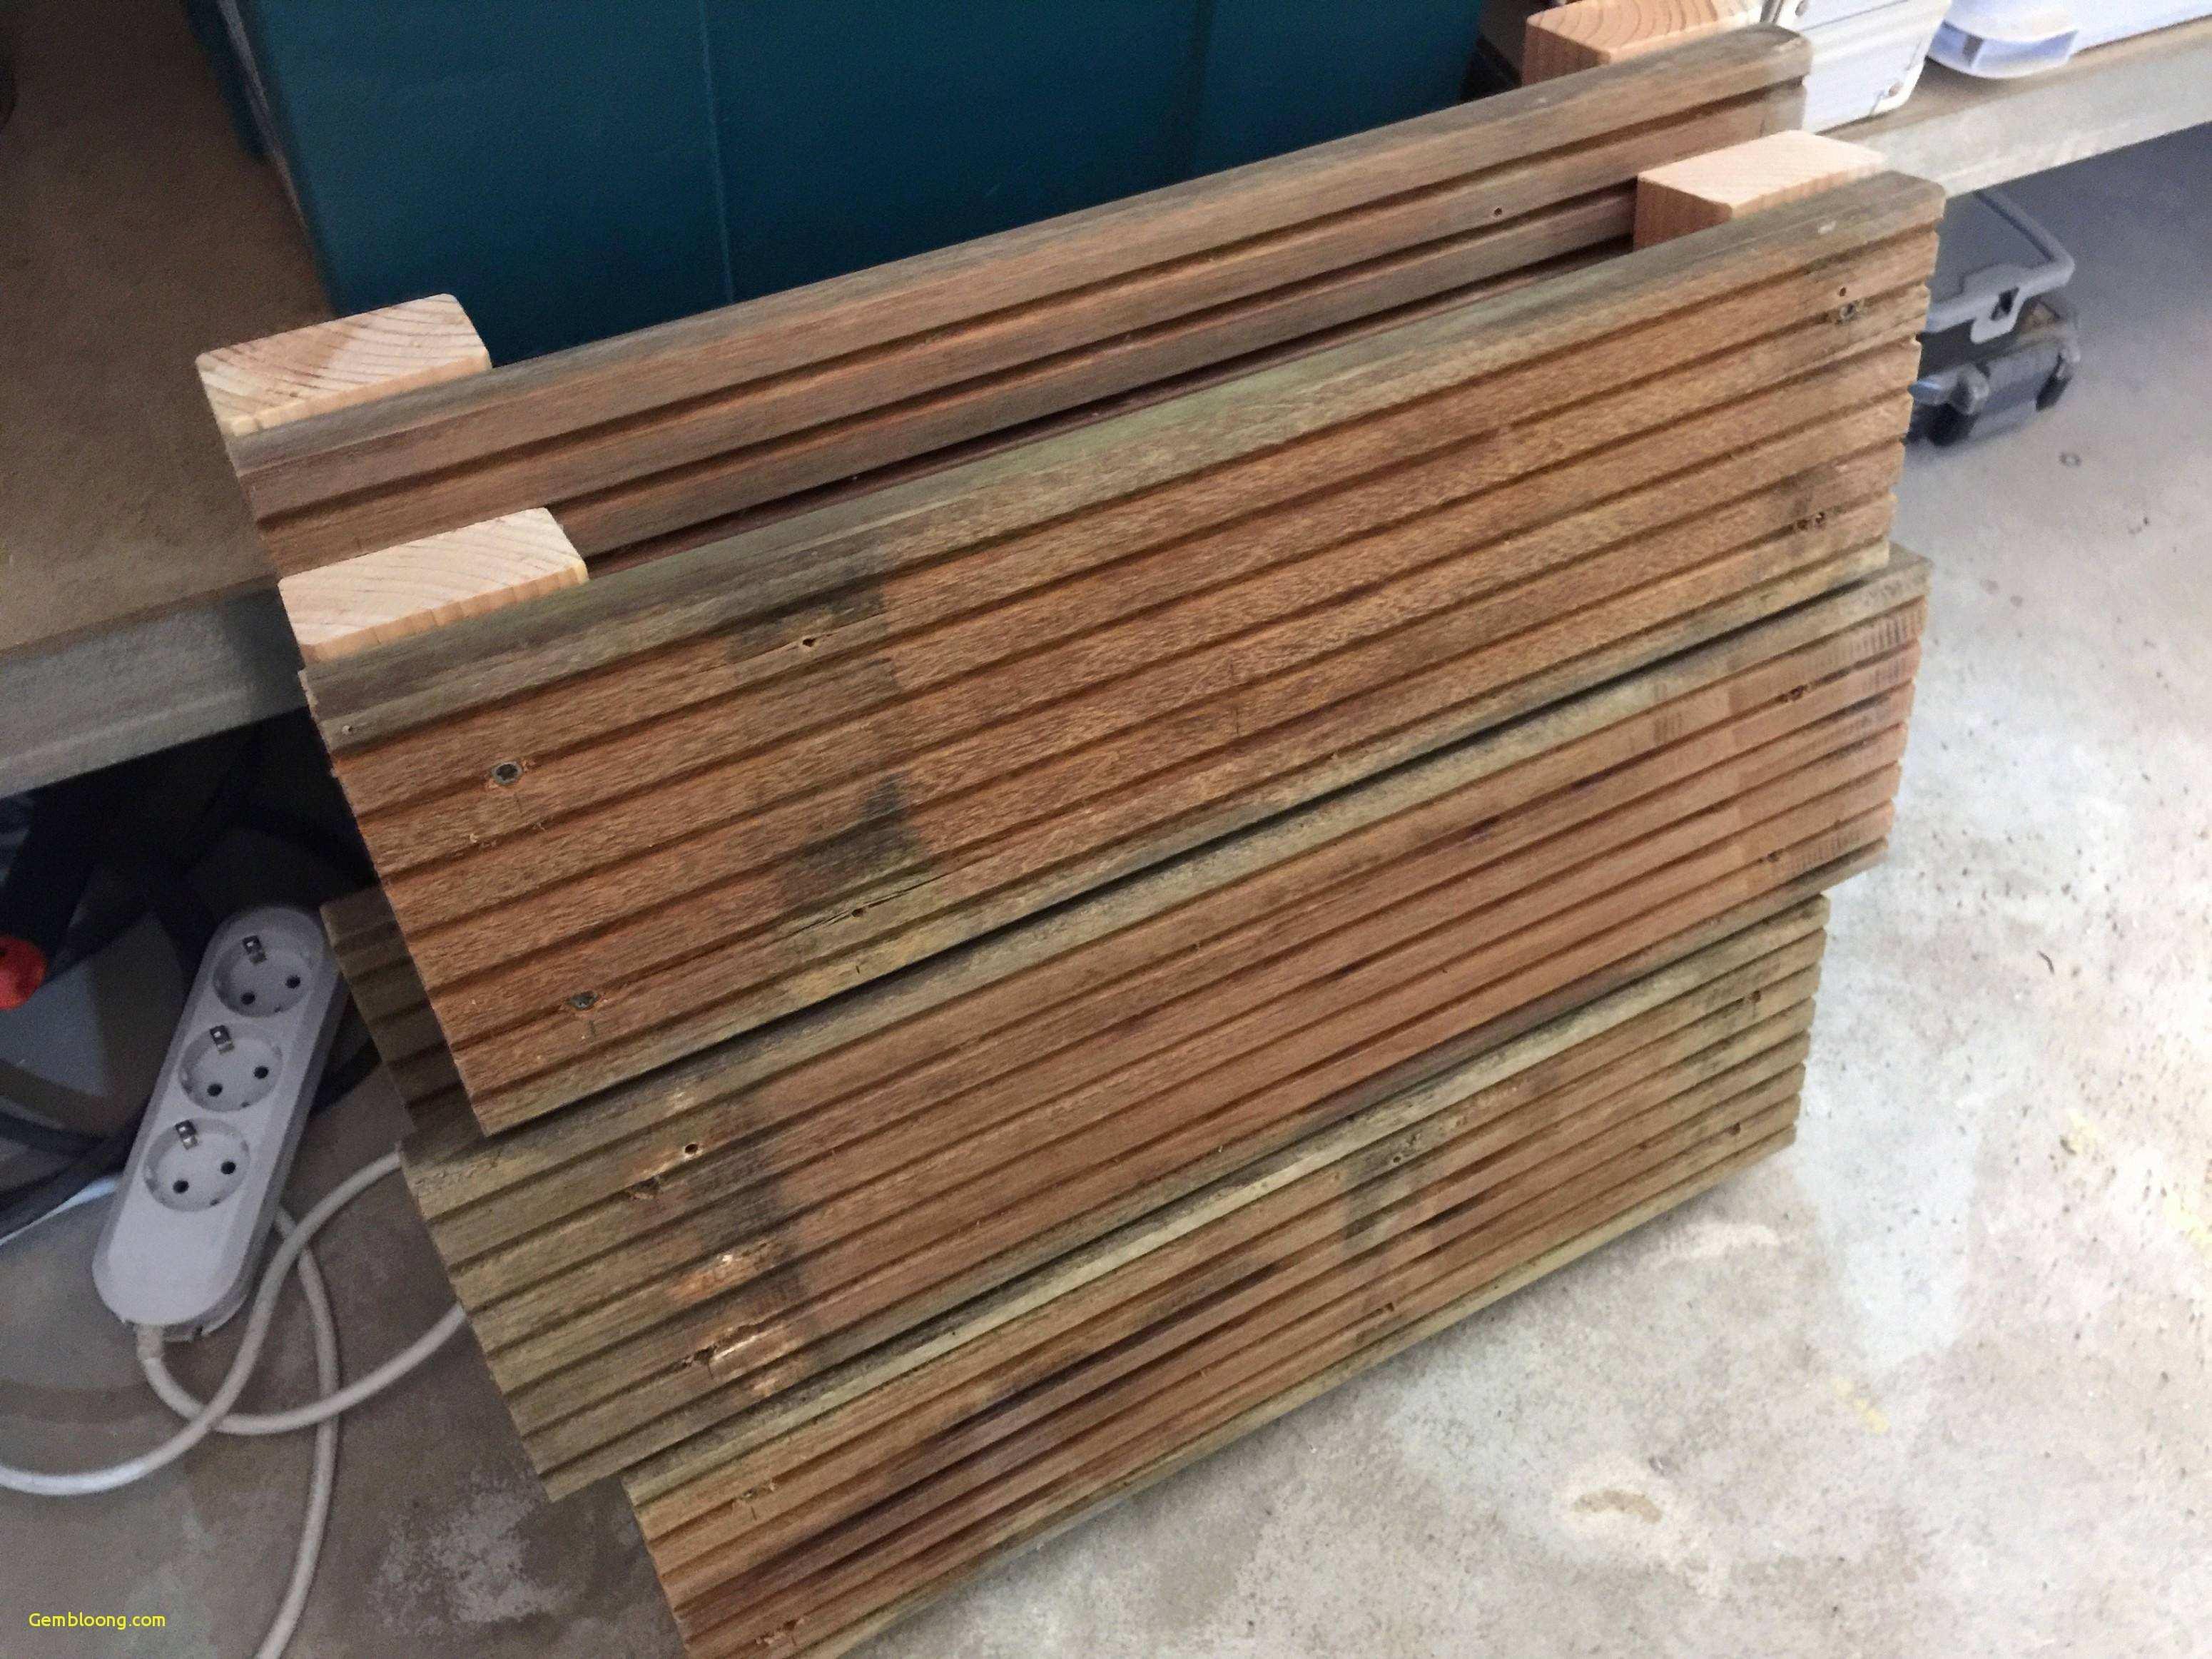 1 hardwood flooring of wood for floors facesinnature pertaining to flooring nj furniture design hard wood flooring new 0d grace place barnegat nj